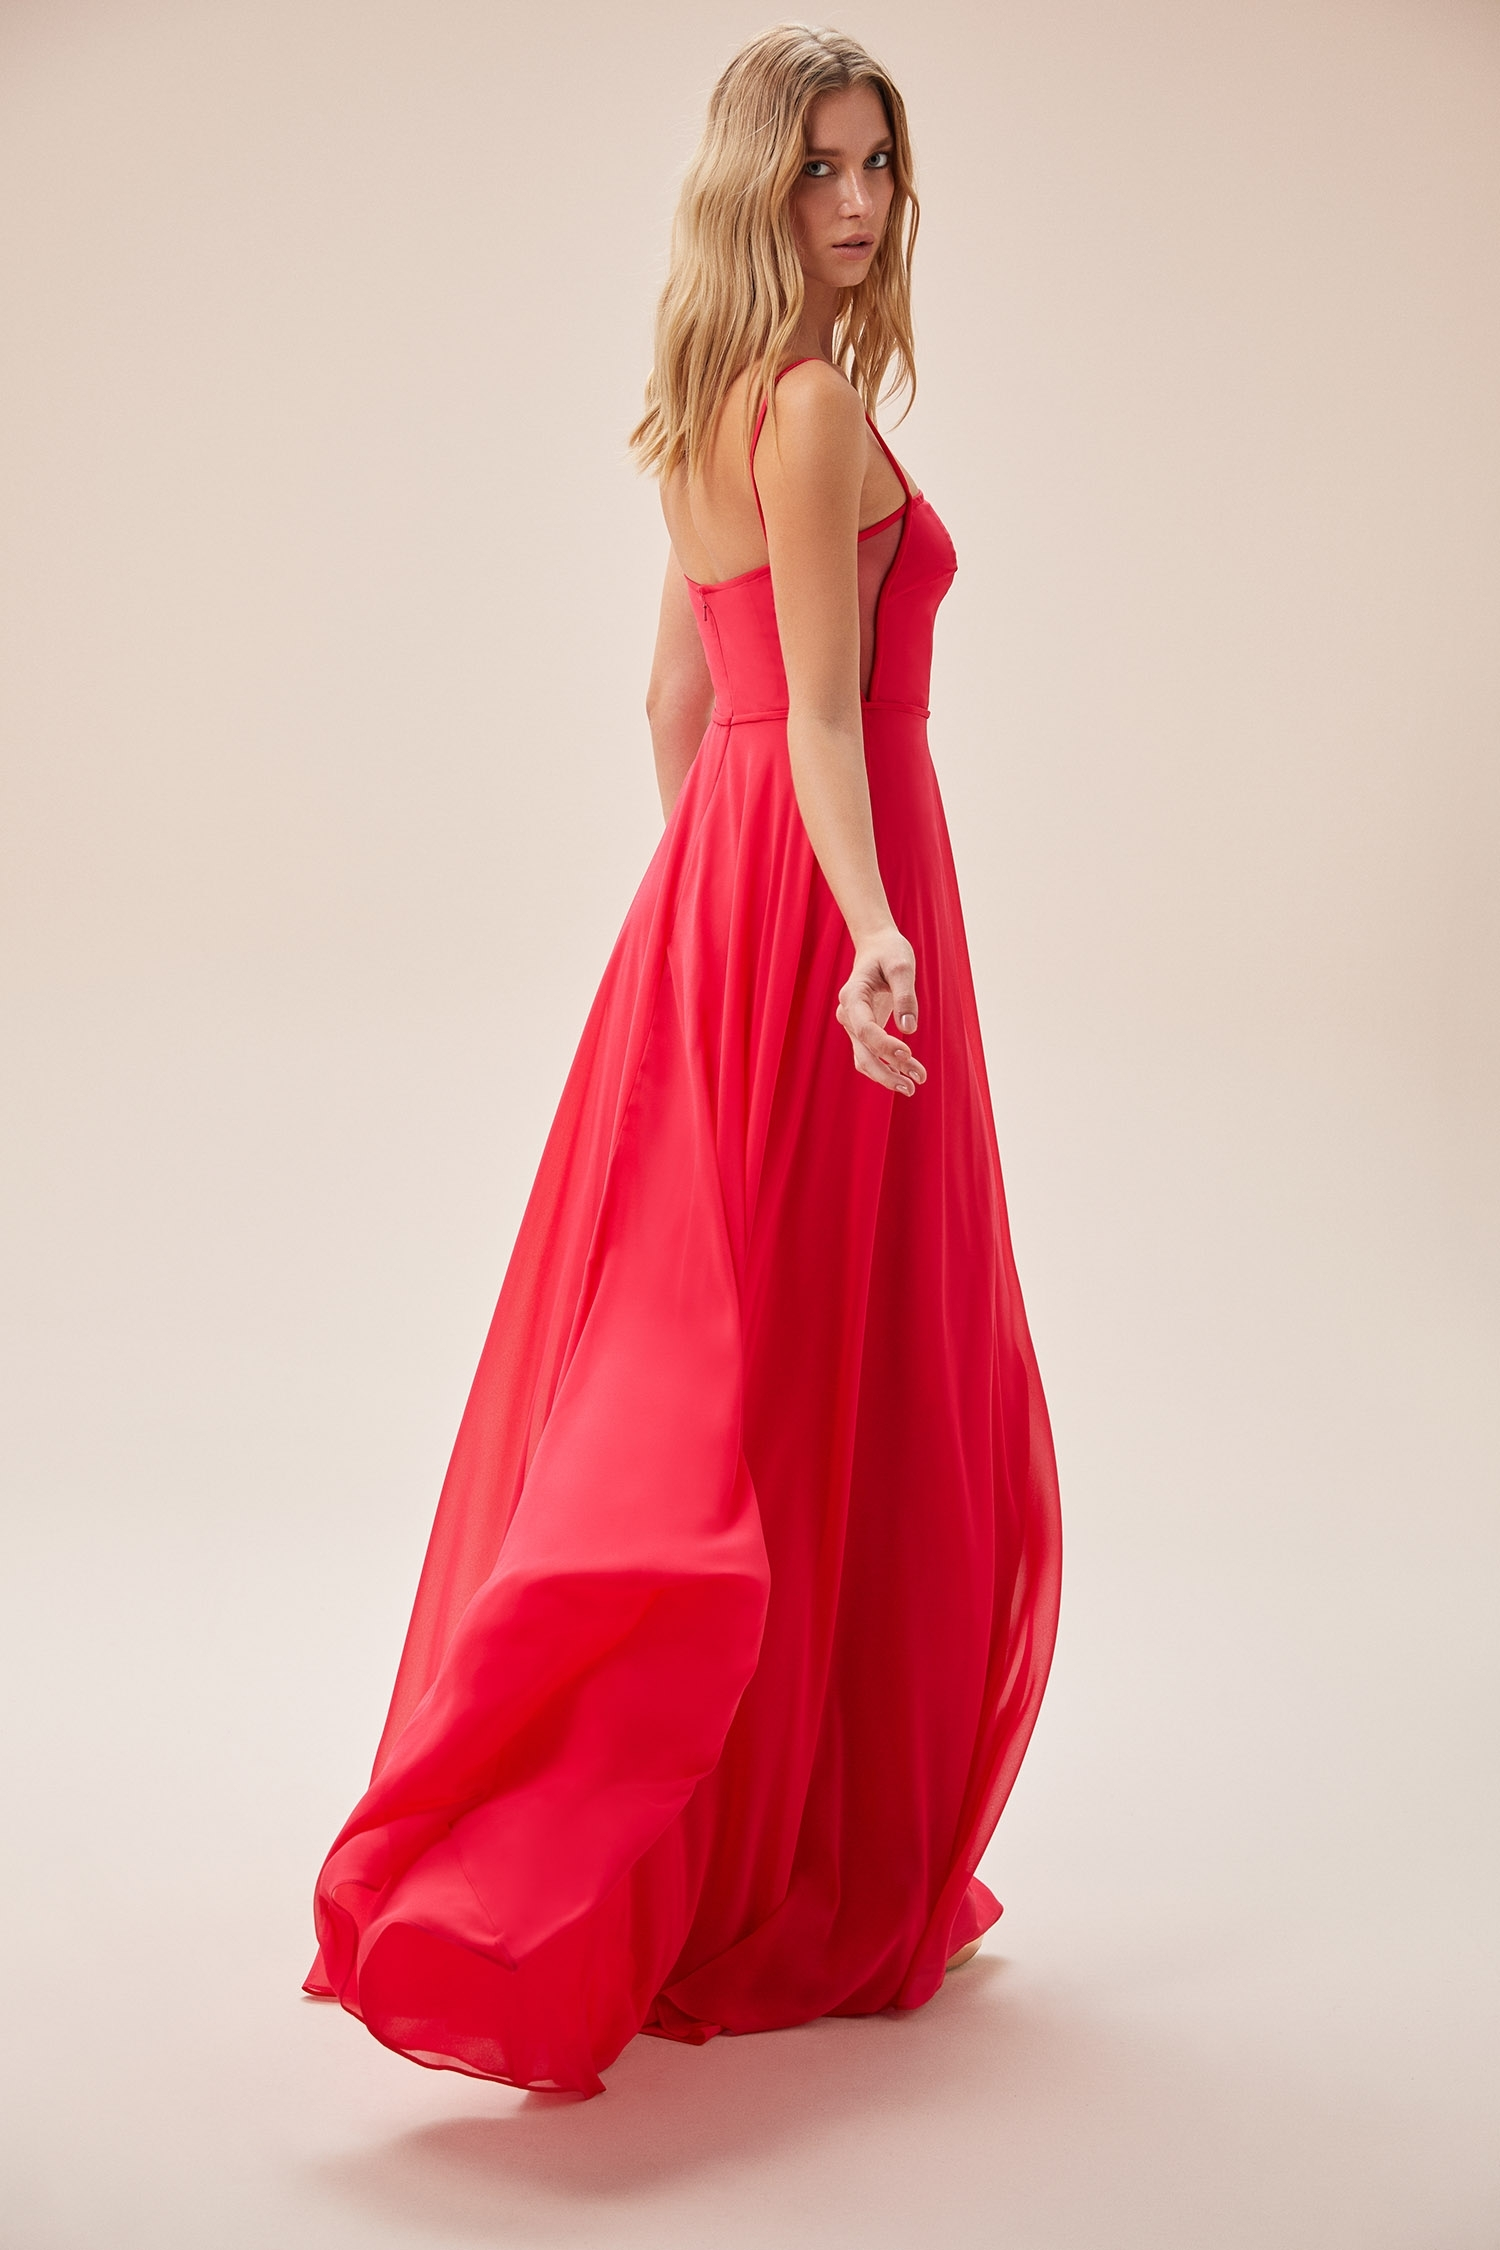 Kardinal Rengi İnce Askılı Şifon Uzun Elbise - Thumbnail